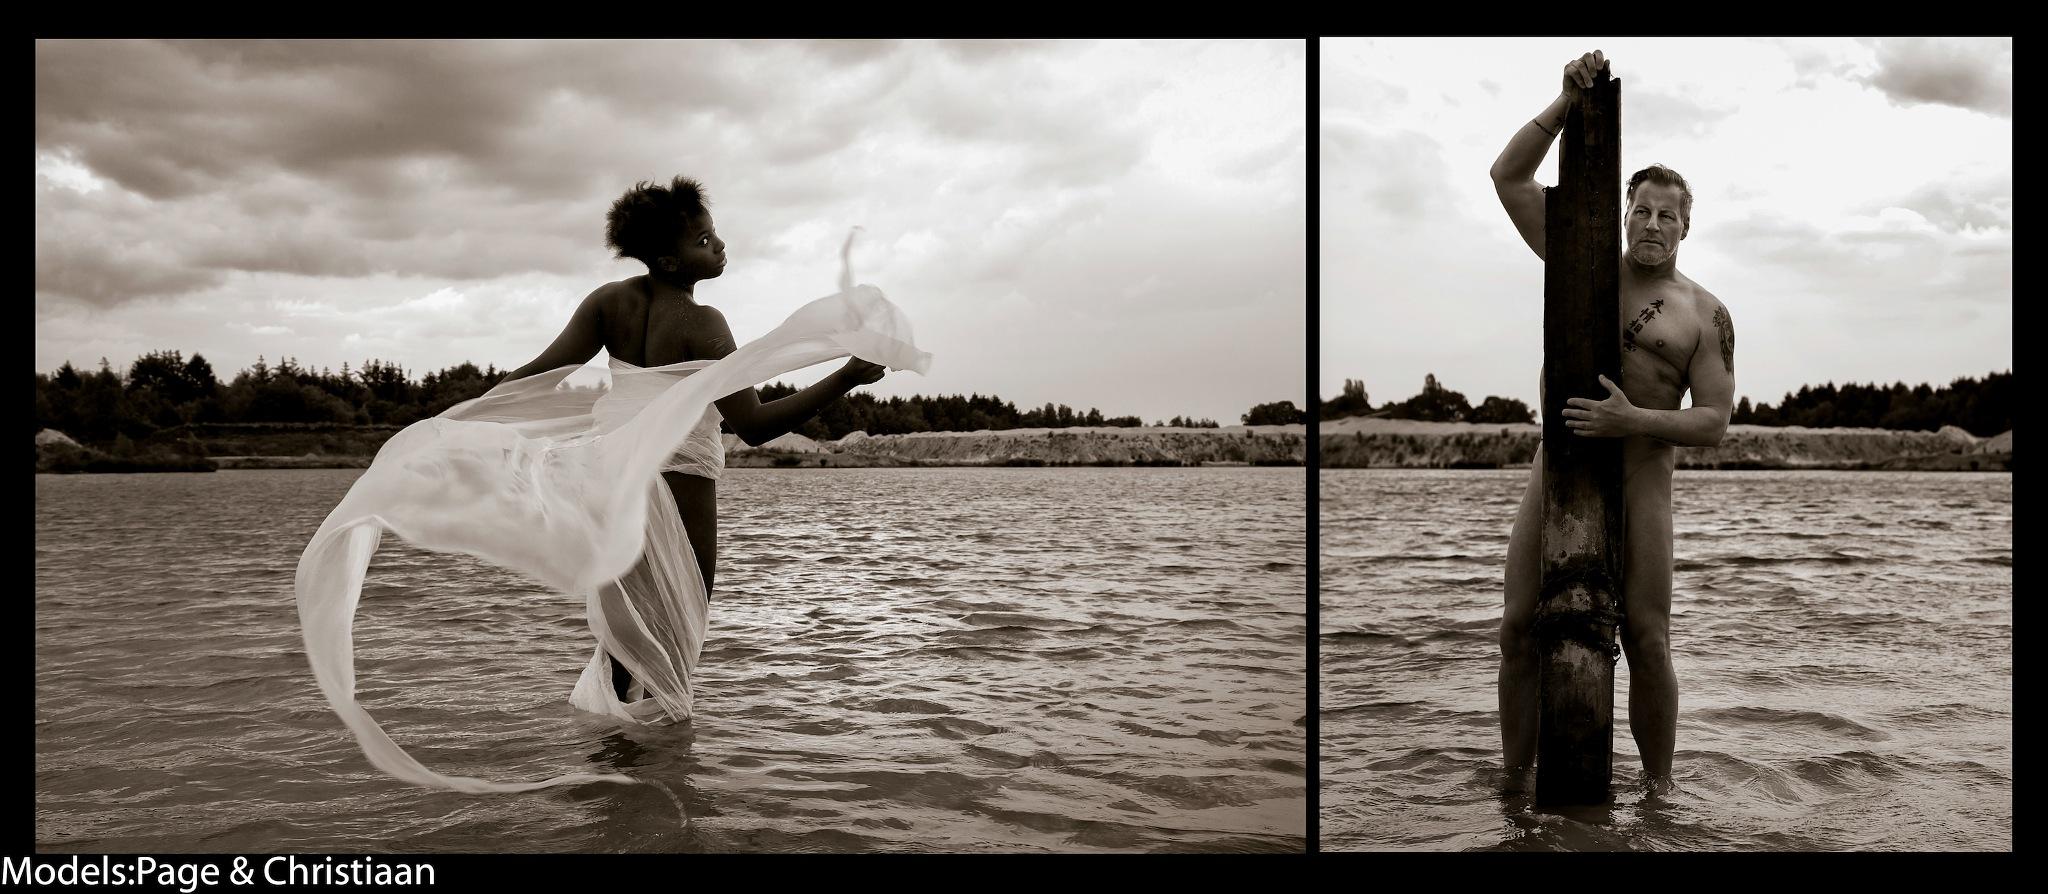 Untitled by PhotographyJongebloed